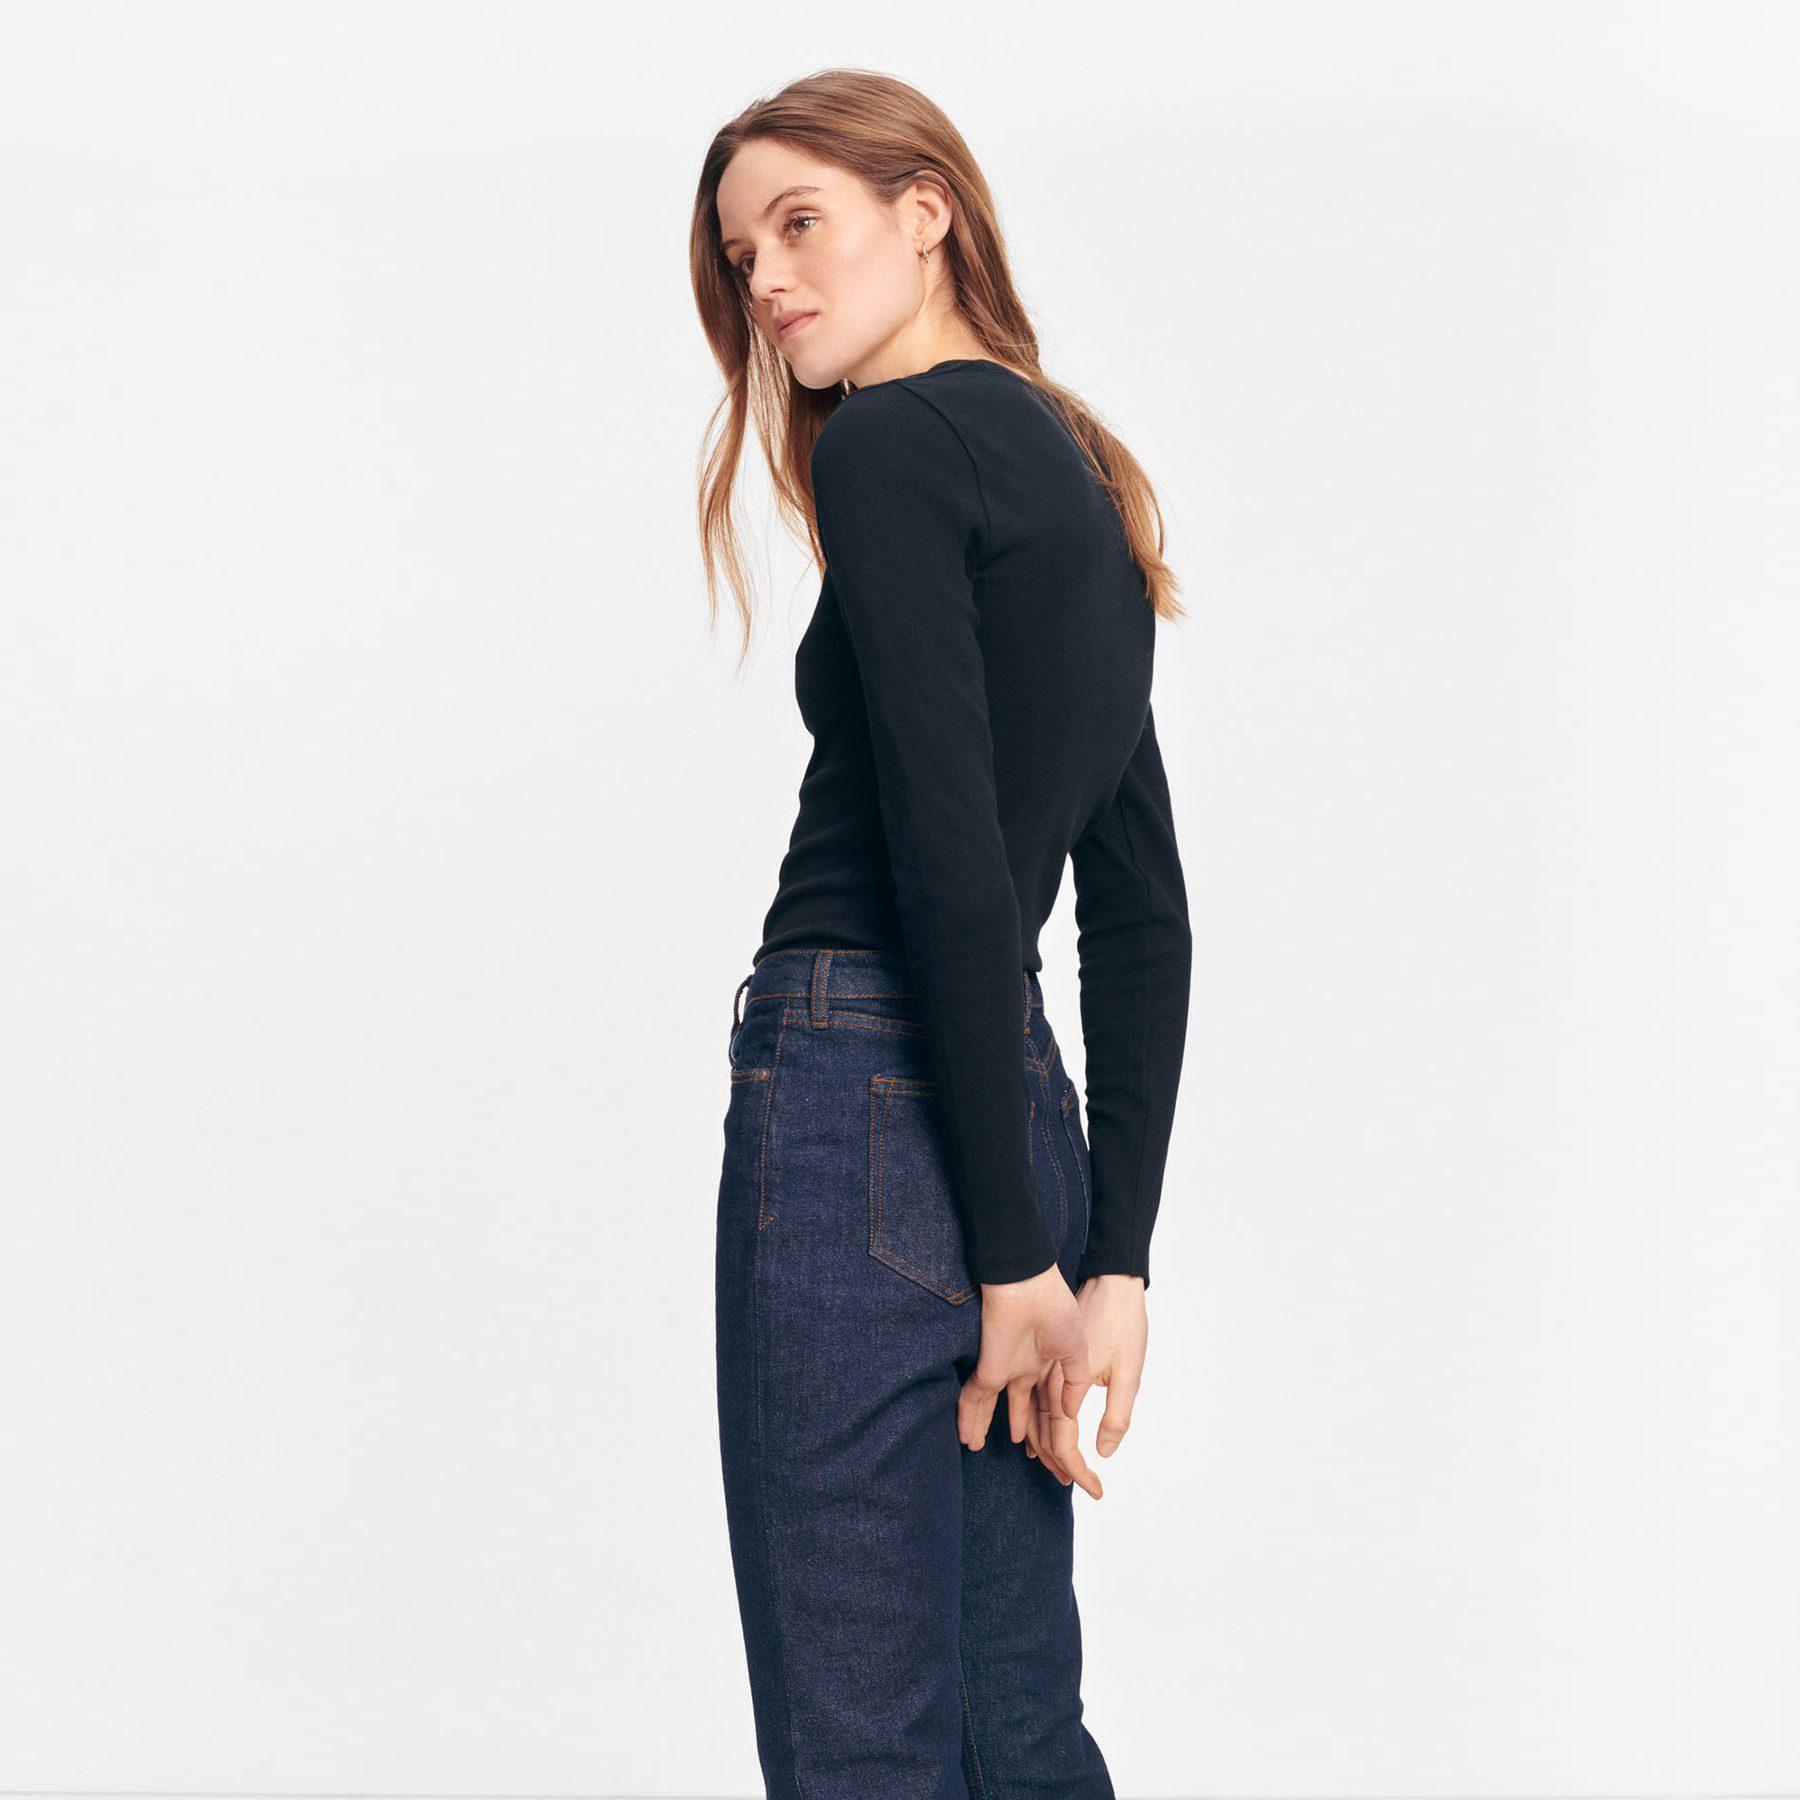 Samsøe & Samsøe Alexa Long Sleeve T-Shirt